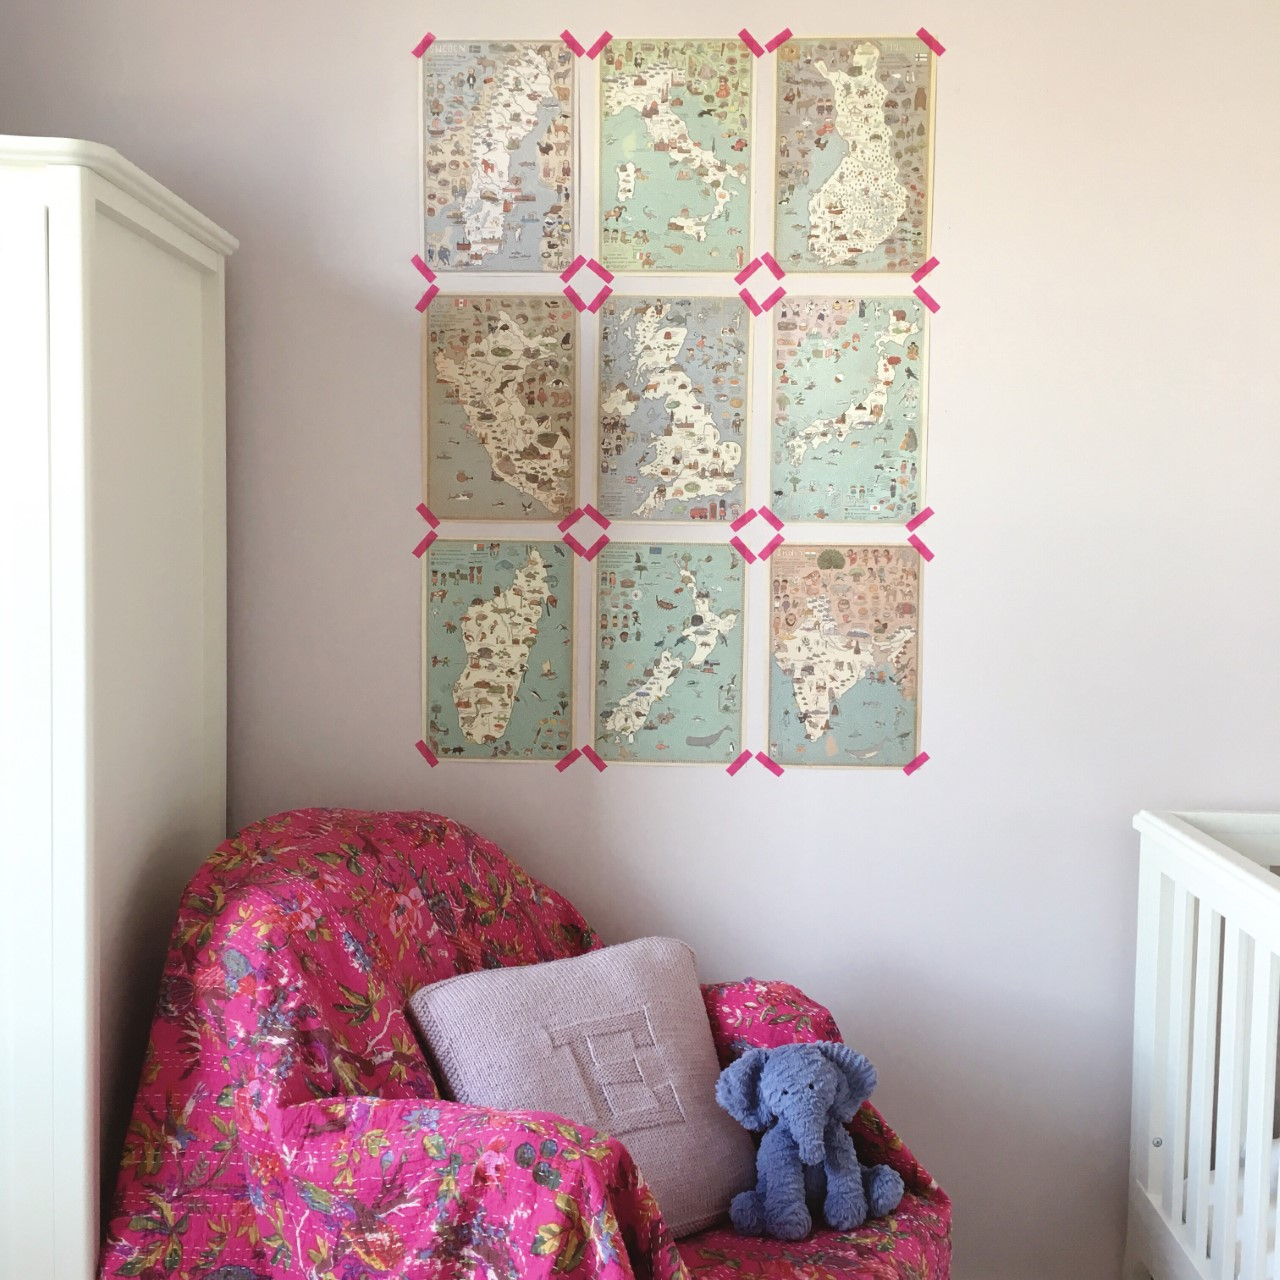 Nursery design in the home of Botanical Artist Charlotte Argyrou